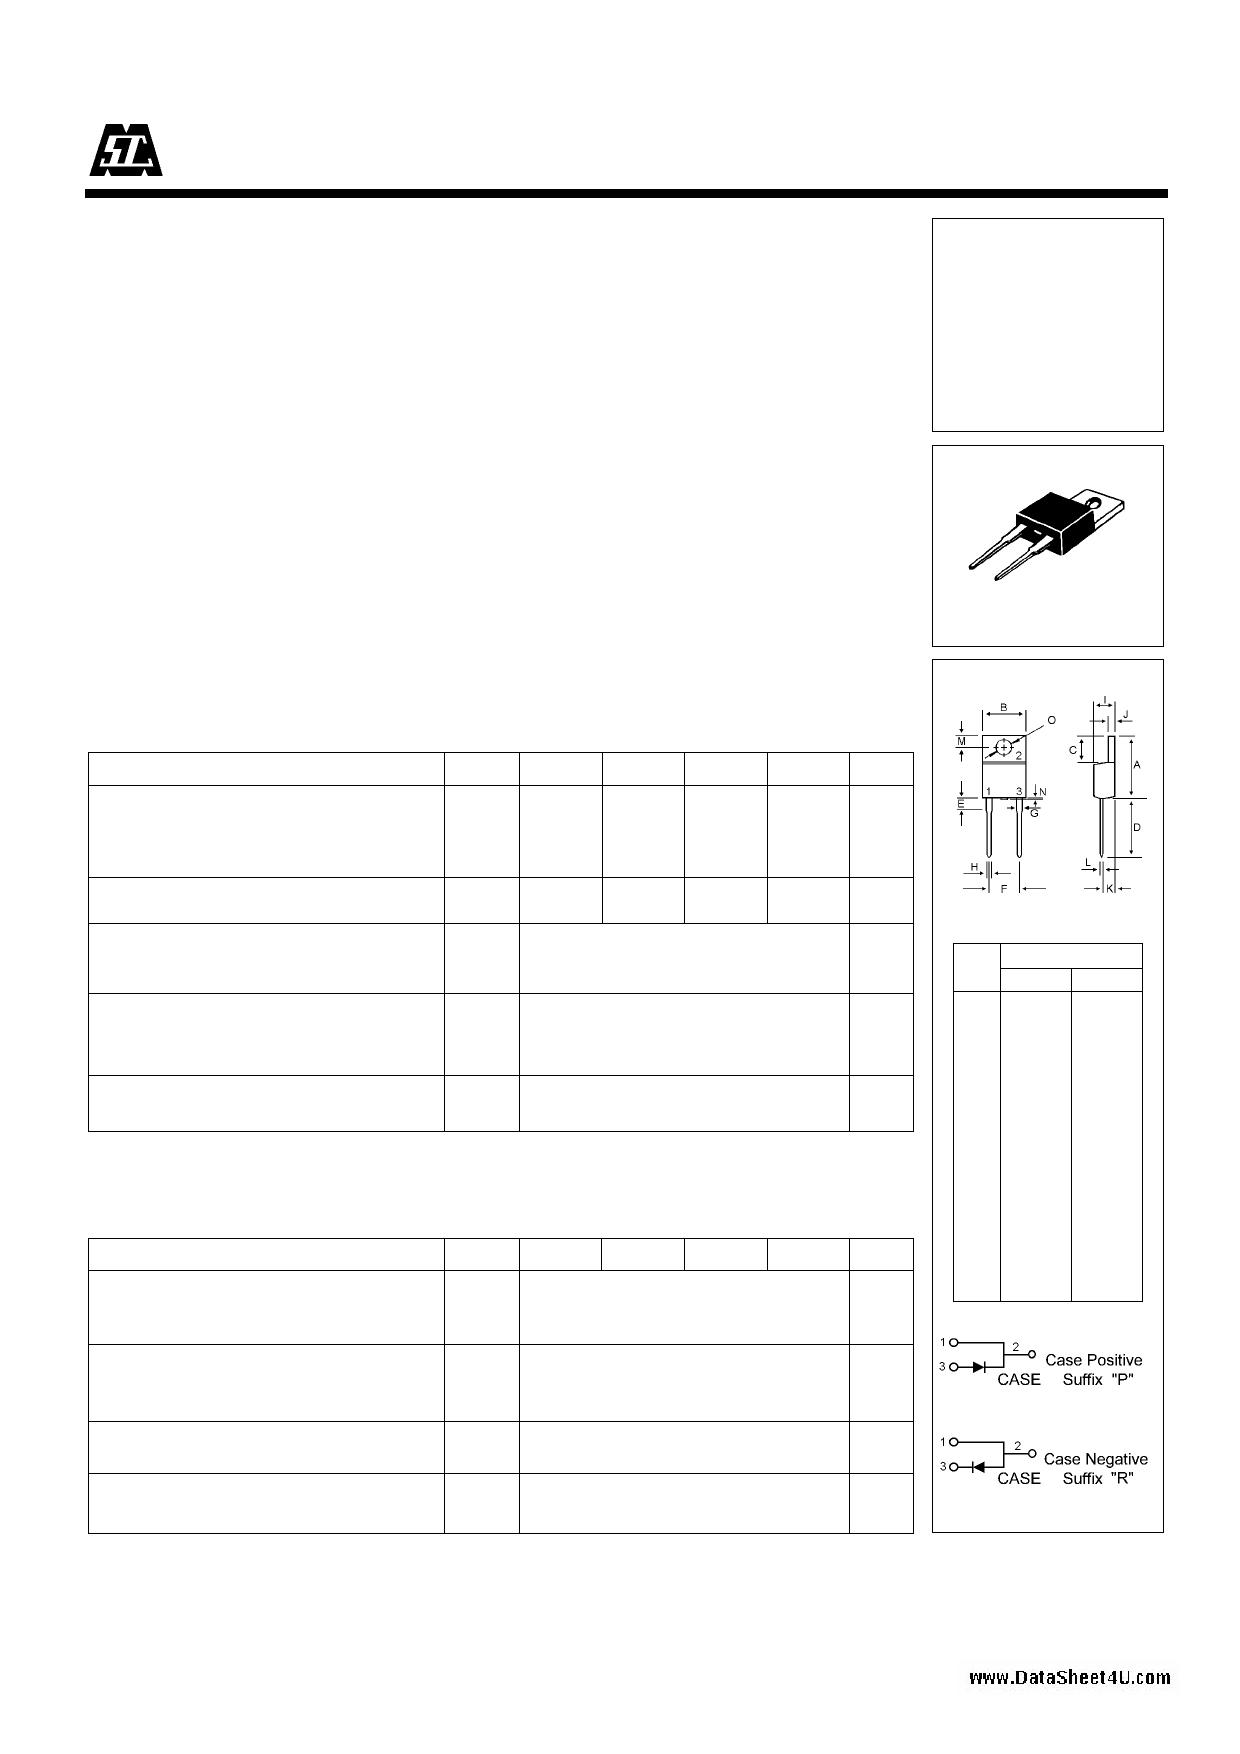 U05A15 даташит PDF